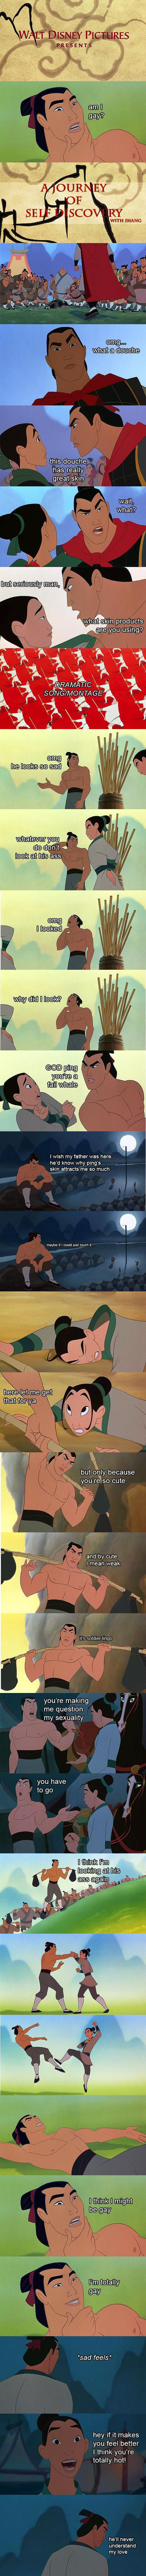 Alternate version of Mulan on point